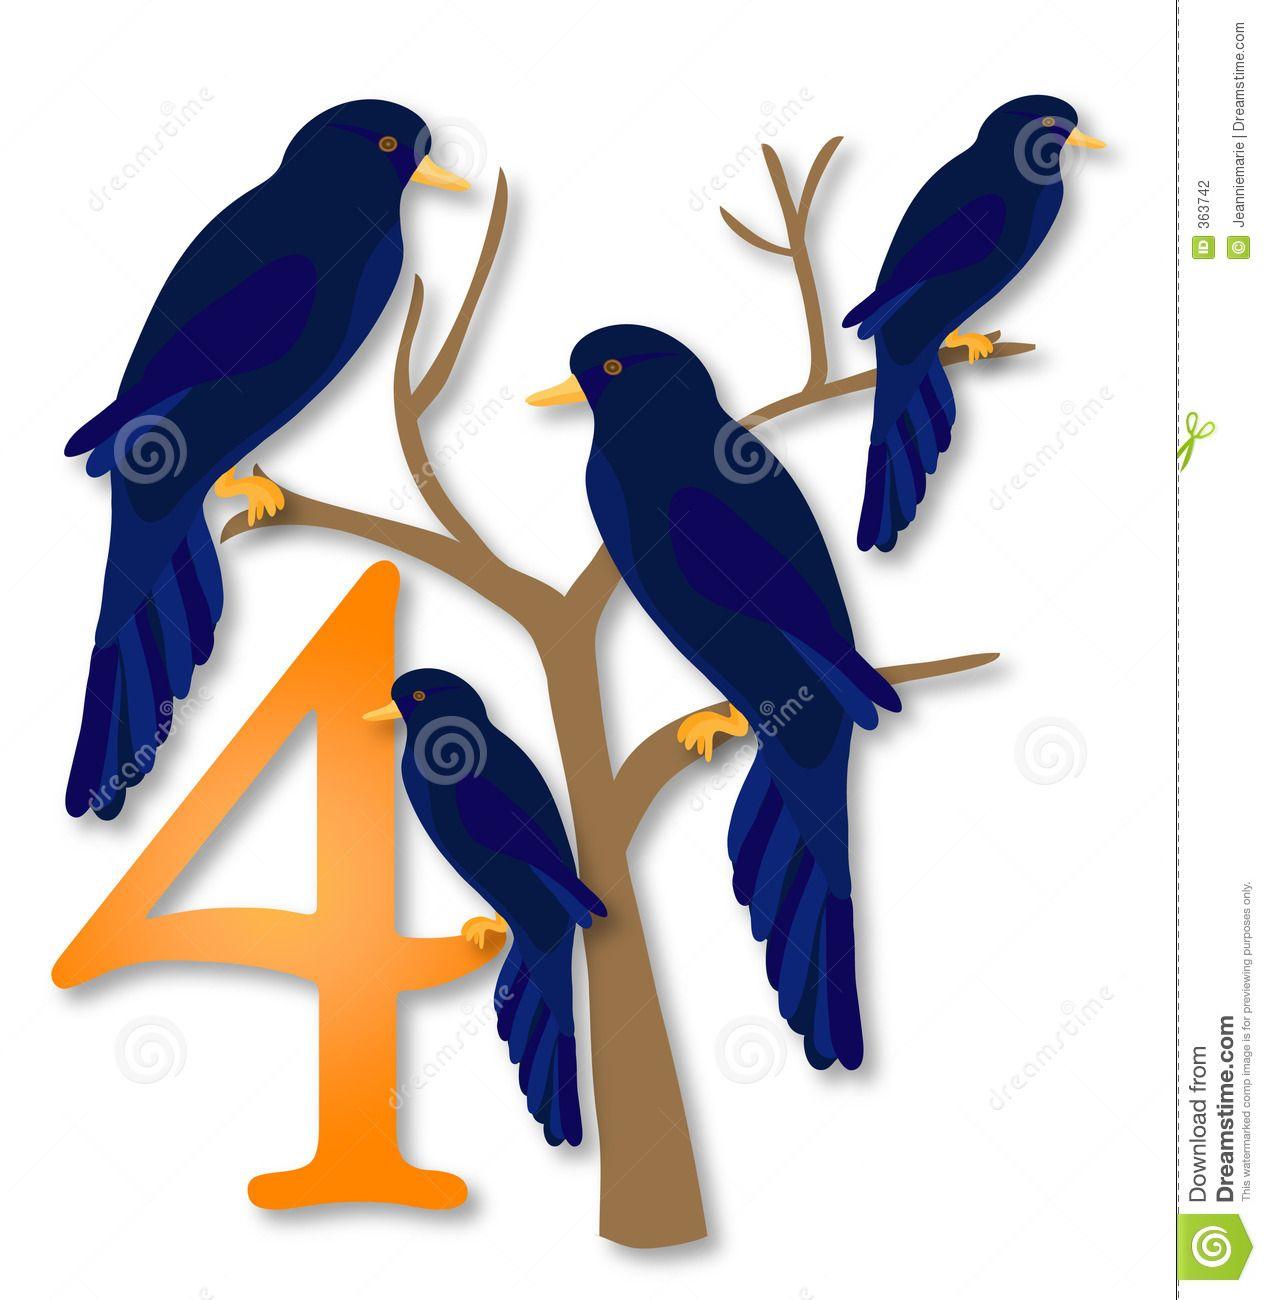 12 days of christmas 4 calling birds h day xmas 12 days rh pinterest com 12 days of christmas clipart border 12 days of christmas web clipart